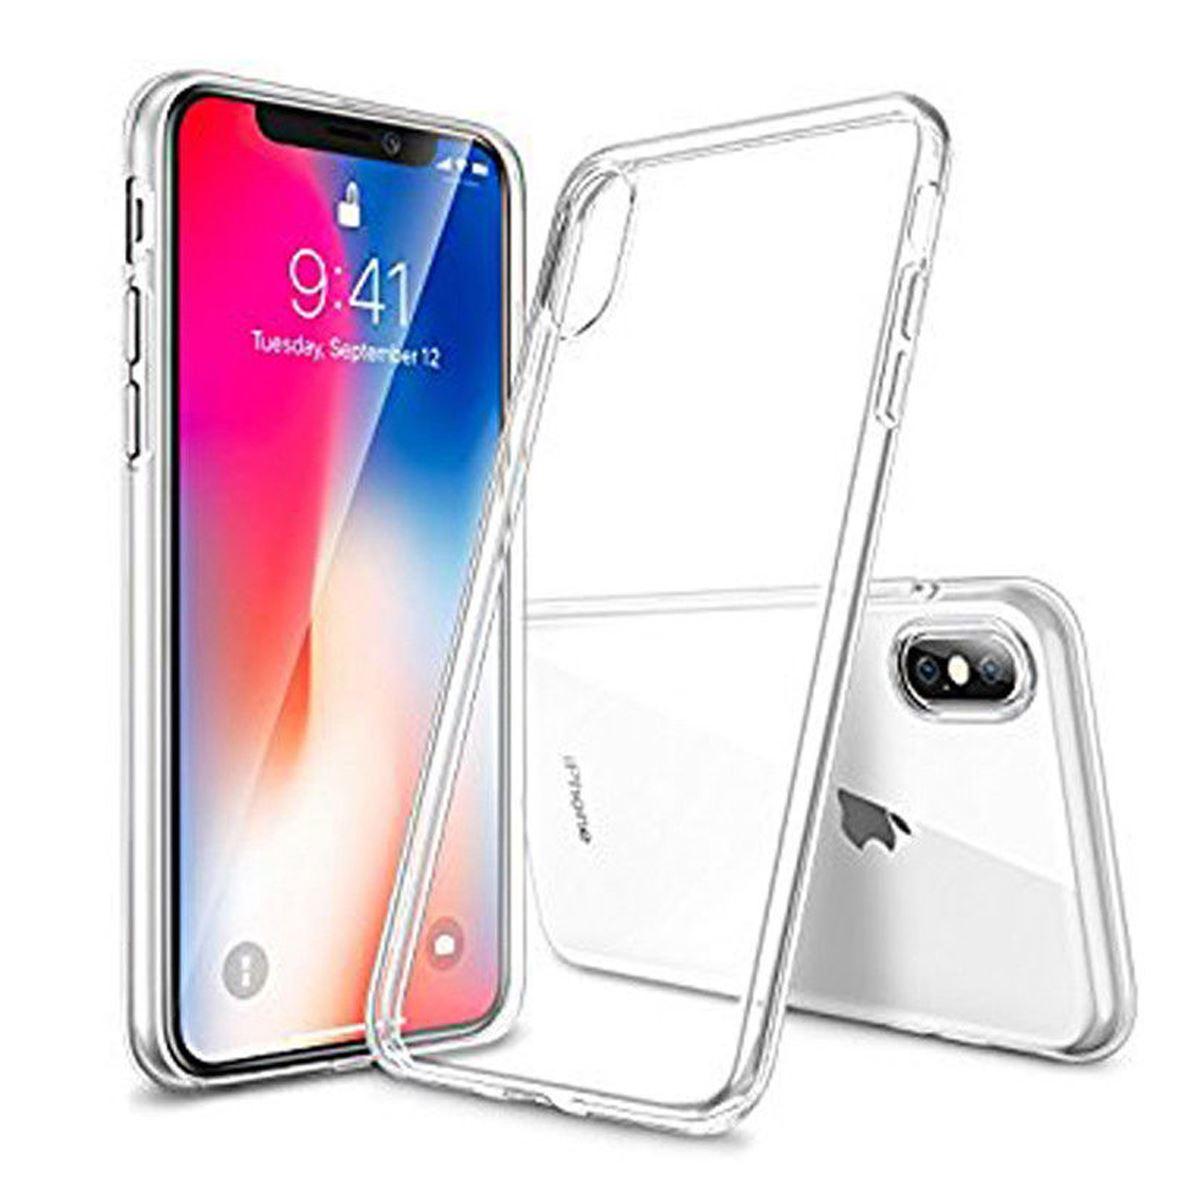 carcasas iphone x transparente